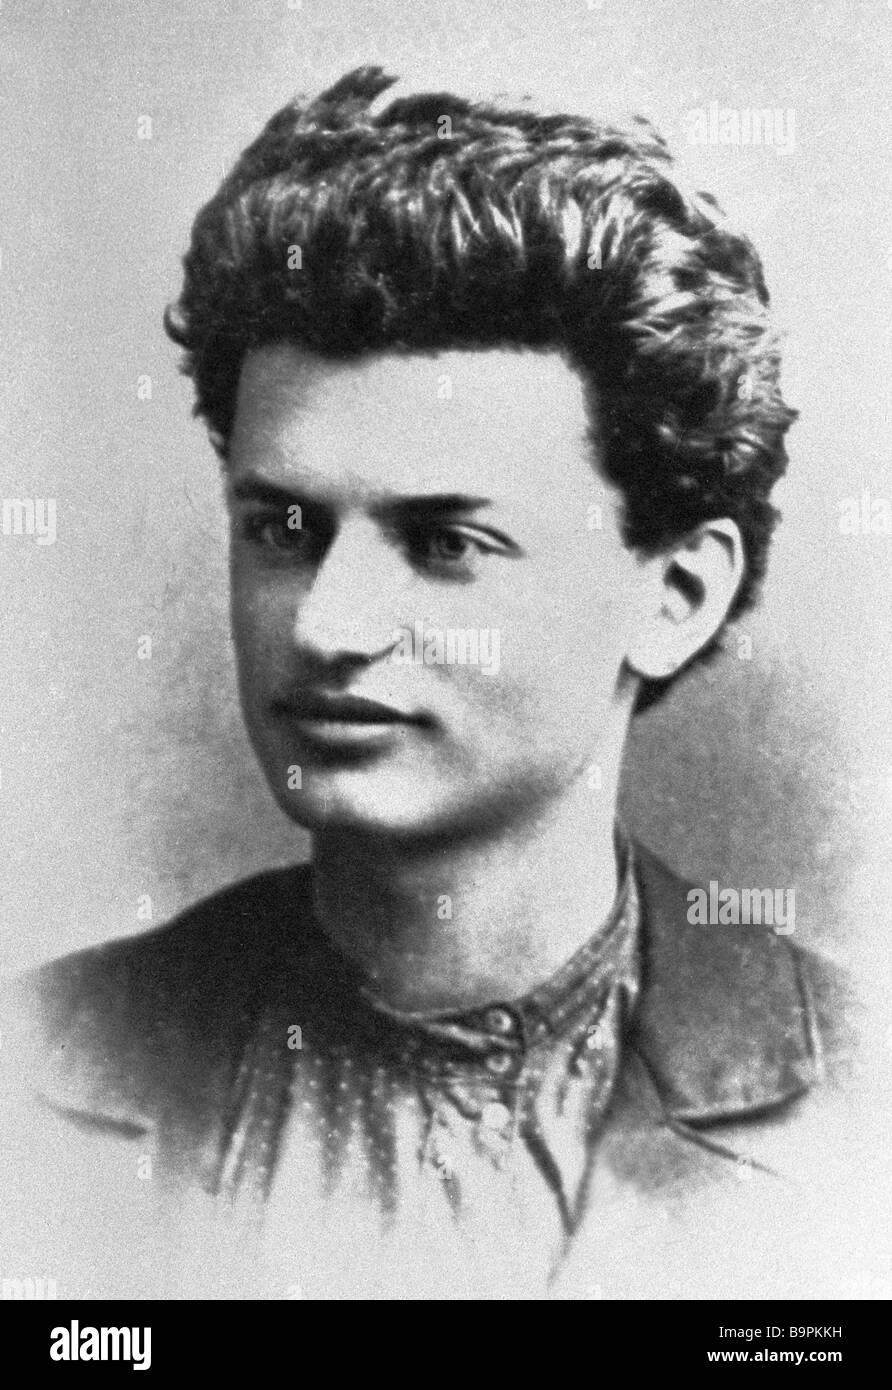 Leon Trotsky 1879 1940 - Stock Image